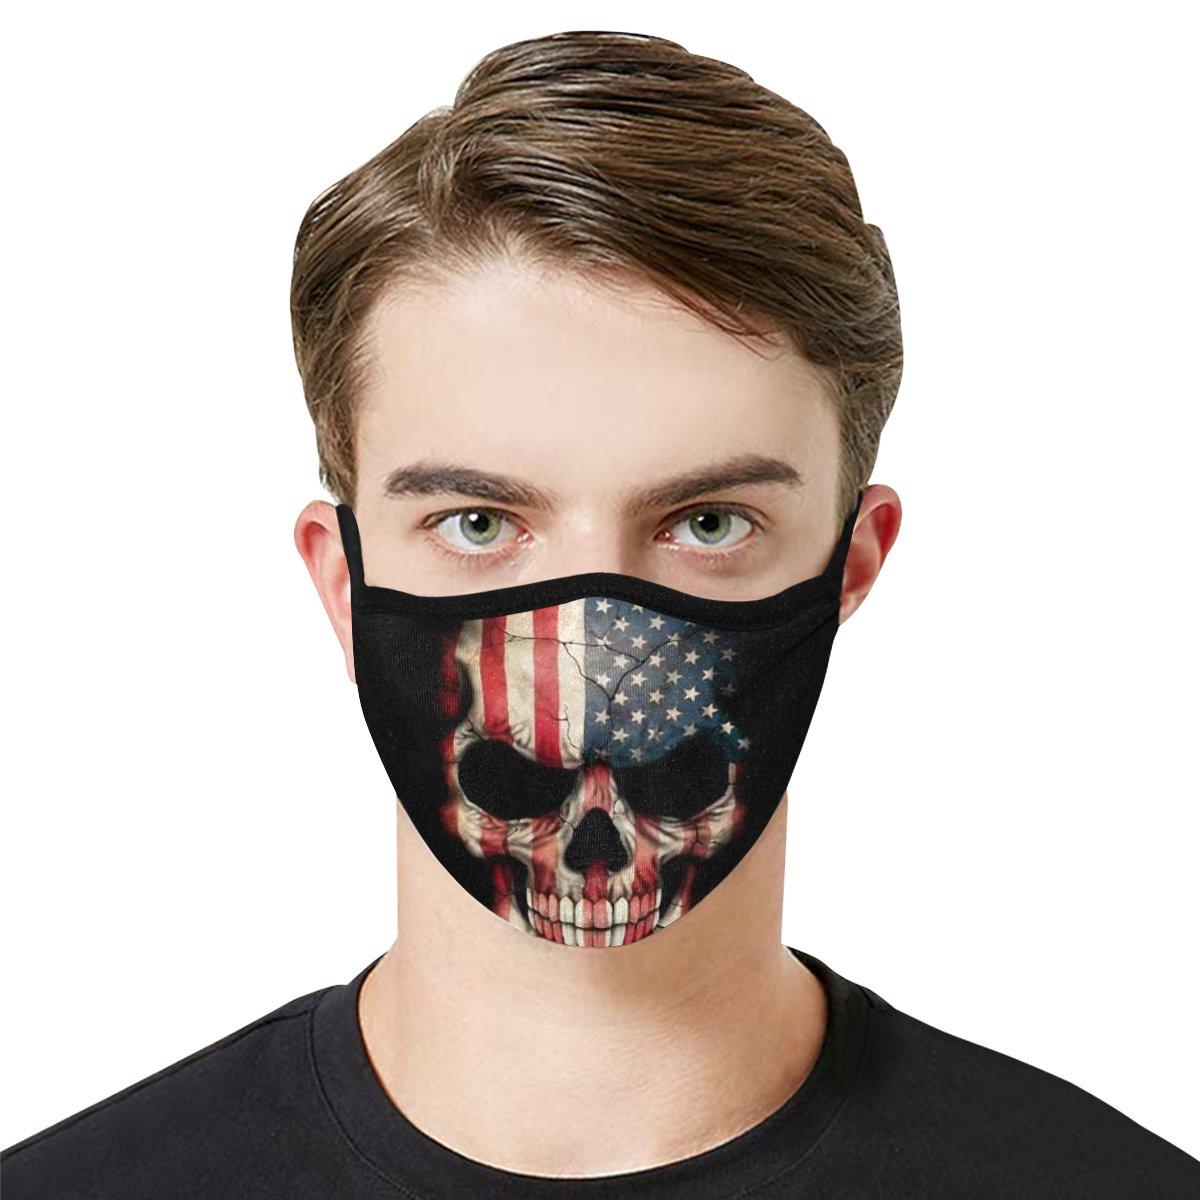 Face Mask Filter PM2.5 American Flag Skull Face Mask Filter PM2.5